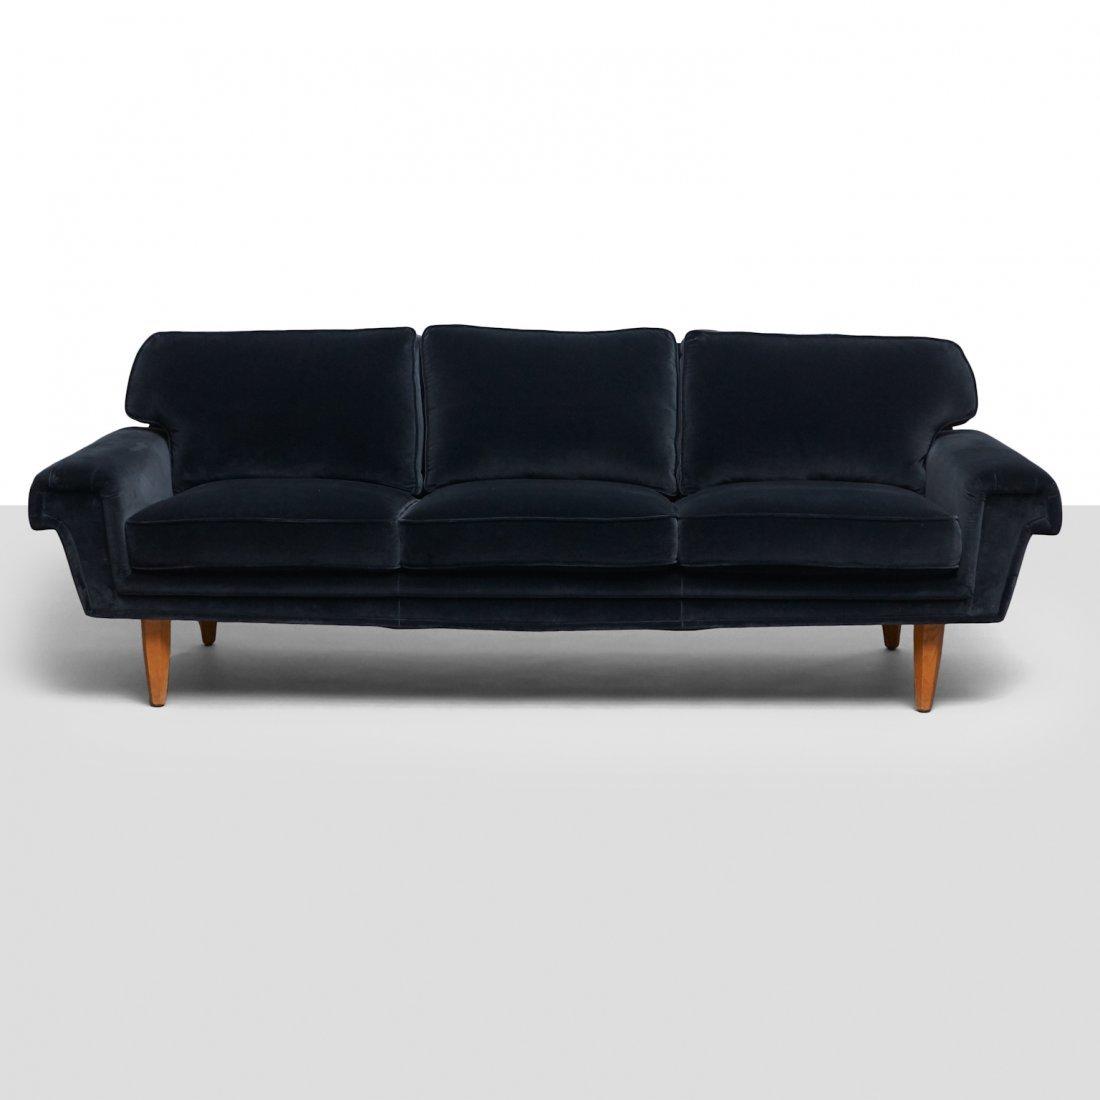 Swedish Design, Three-Seat Sofa - 2